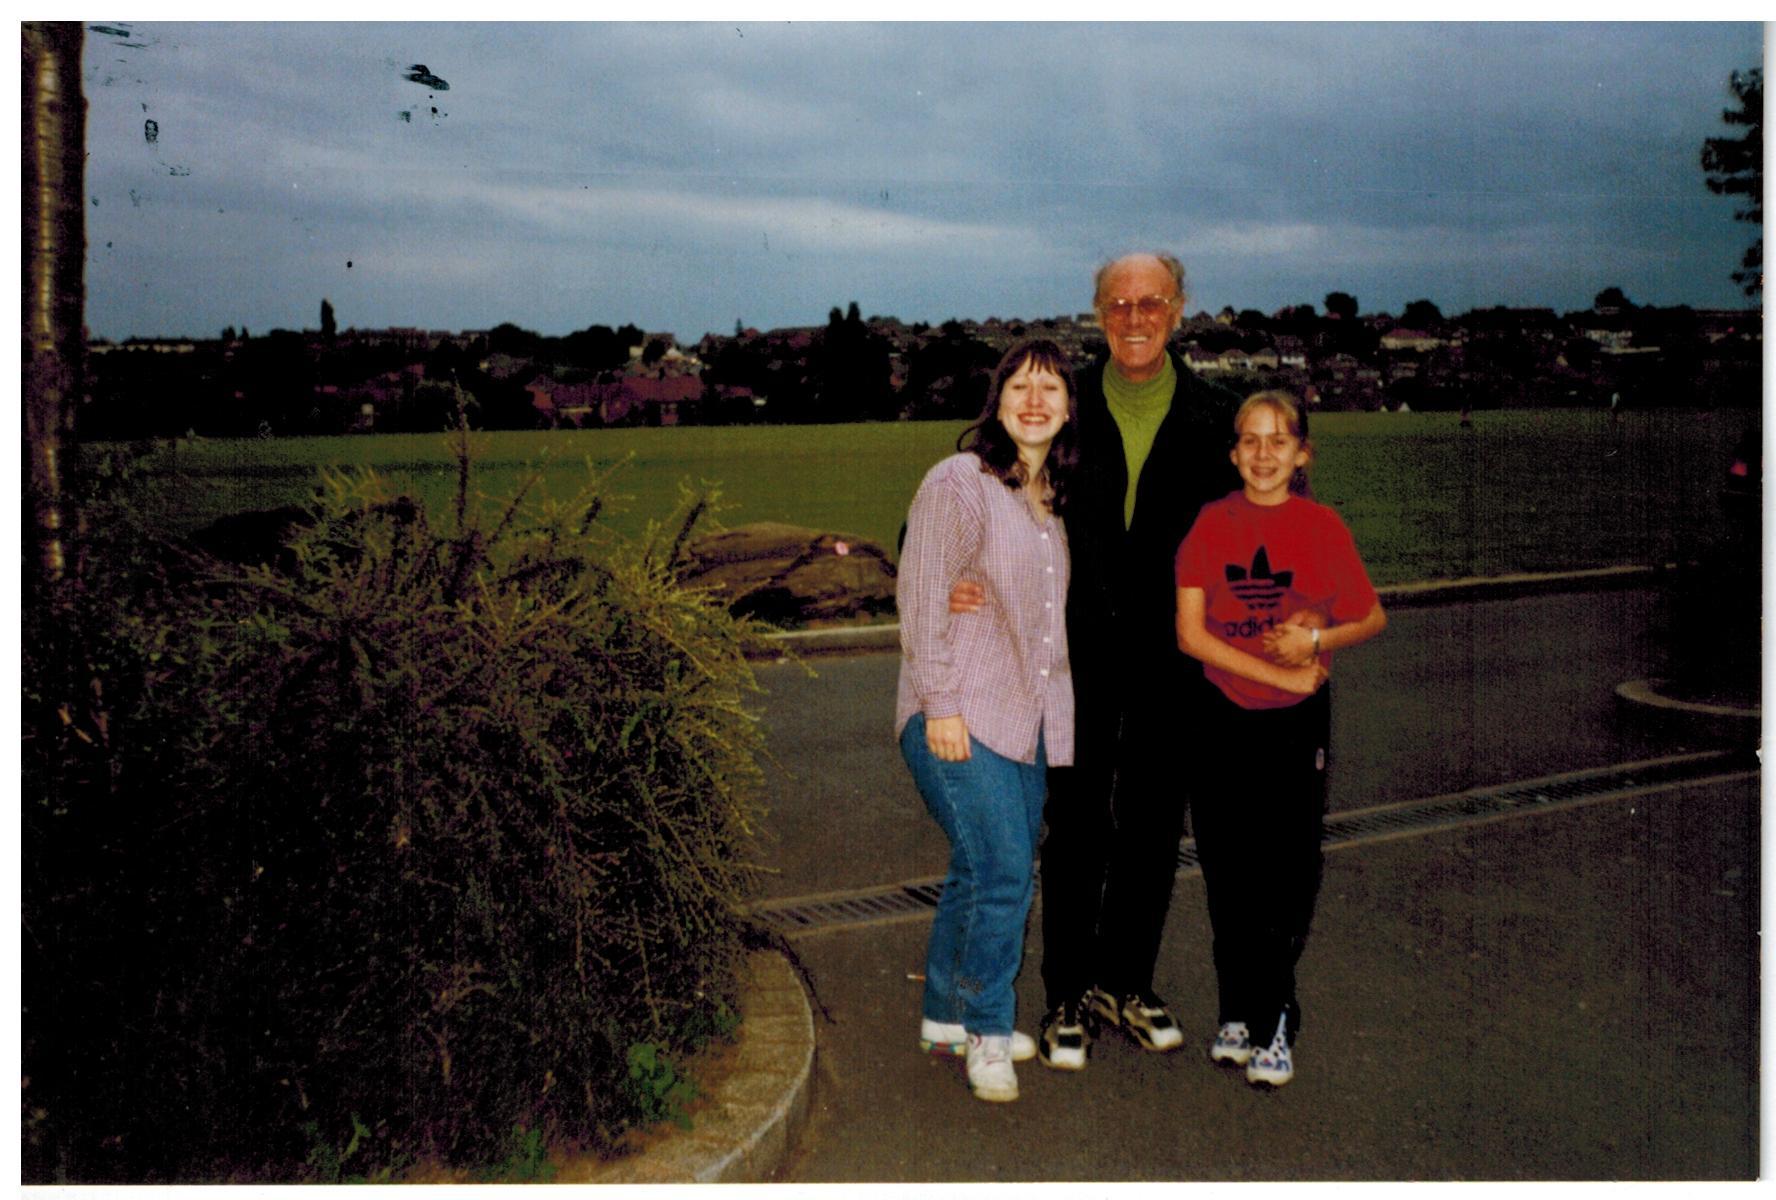 N114_Rounders_Homer-Hill_[15-07-1998]